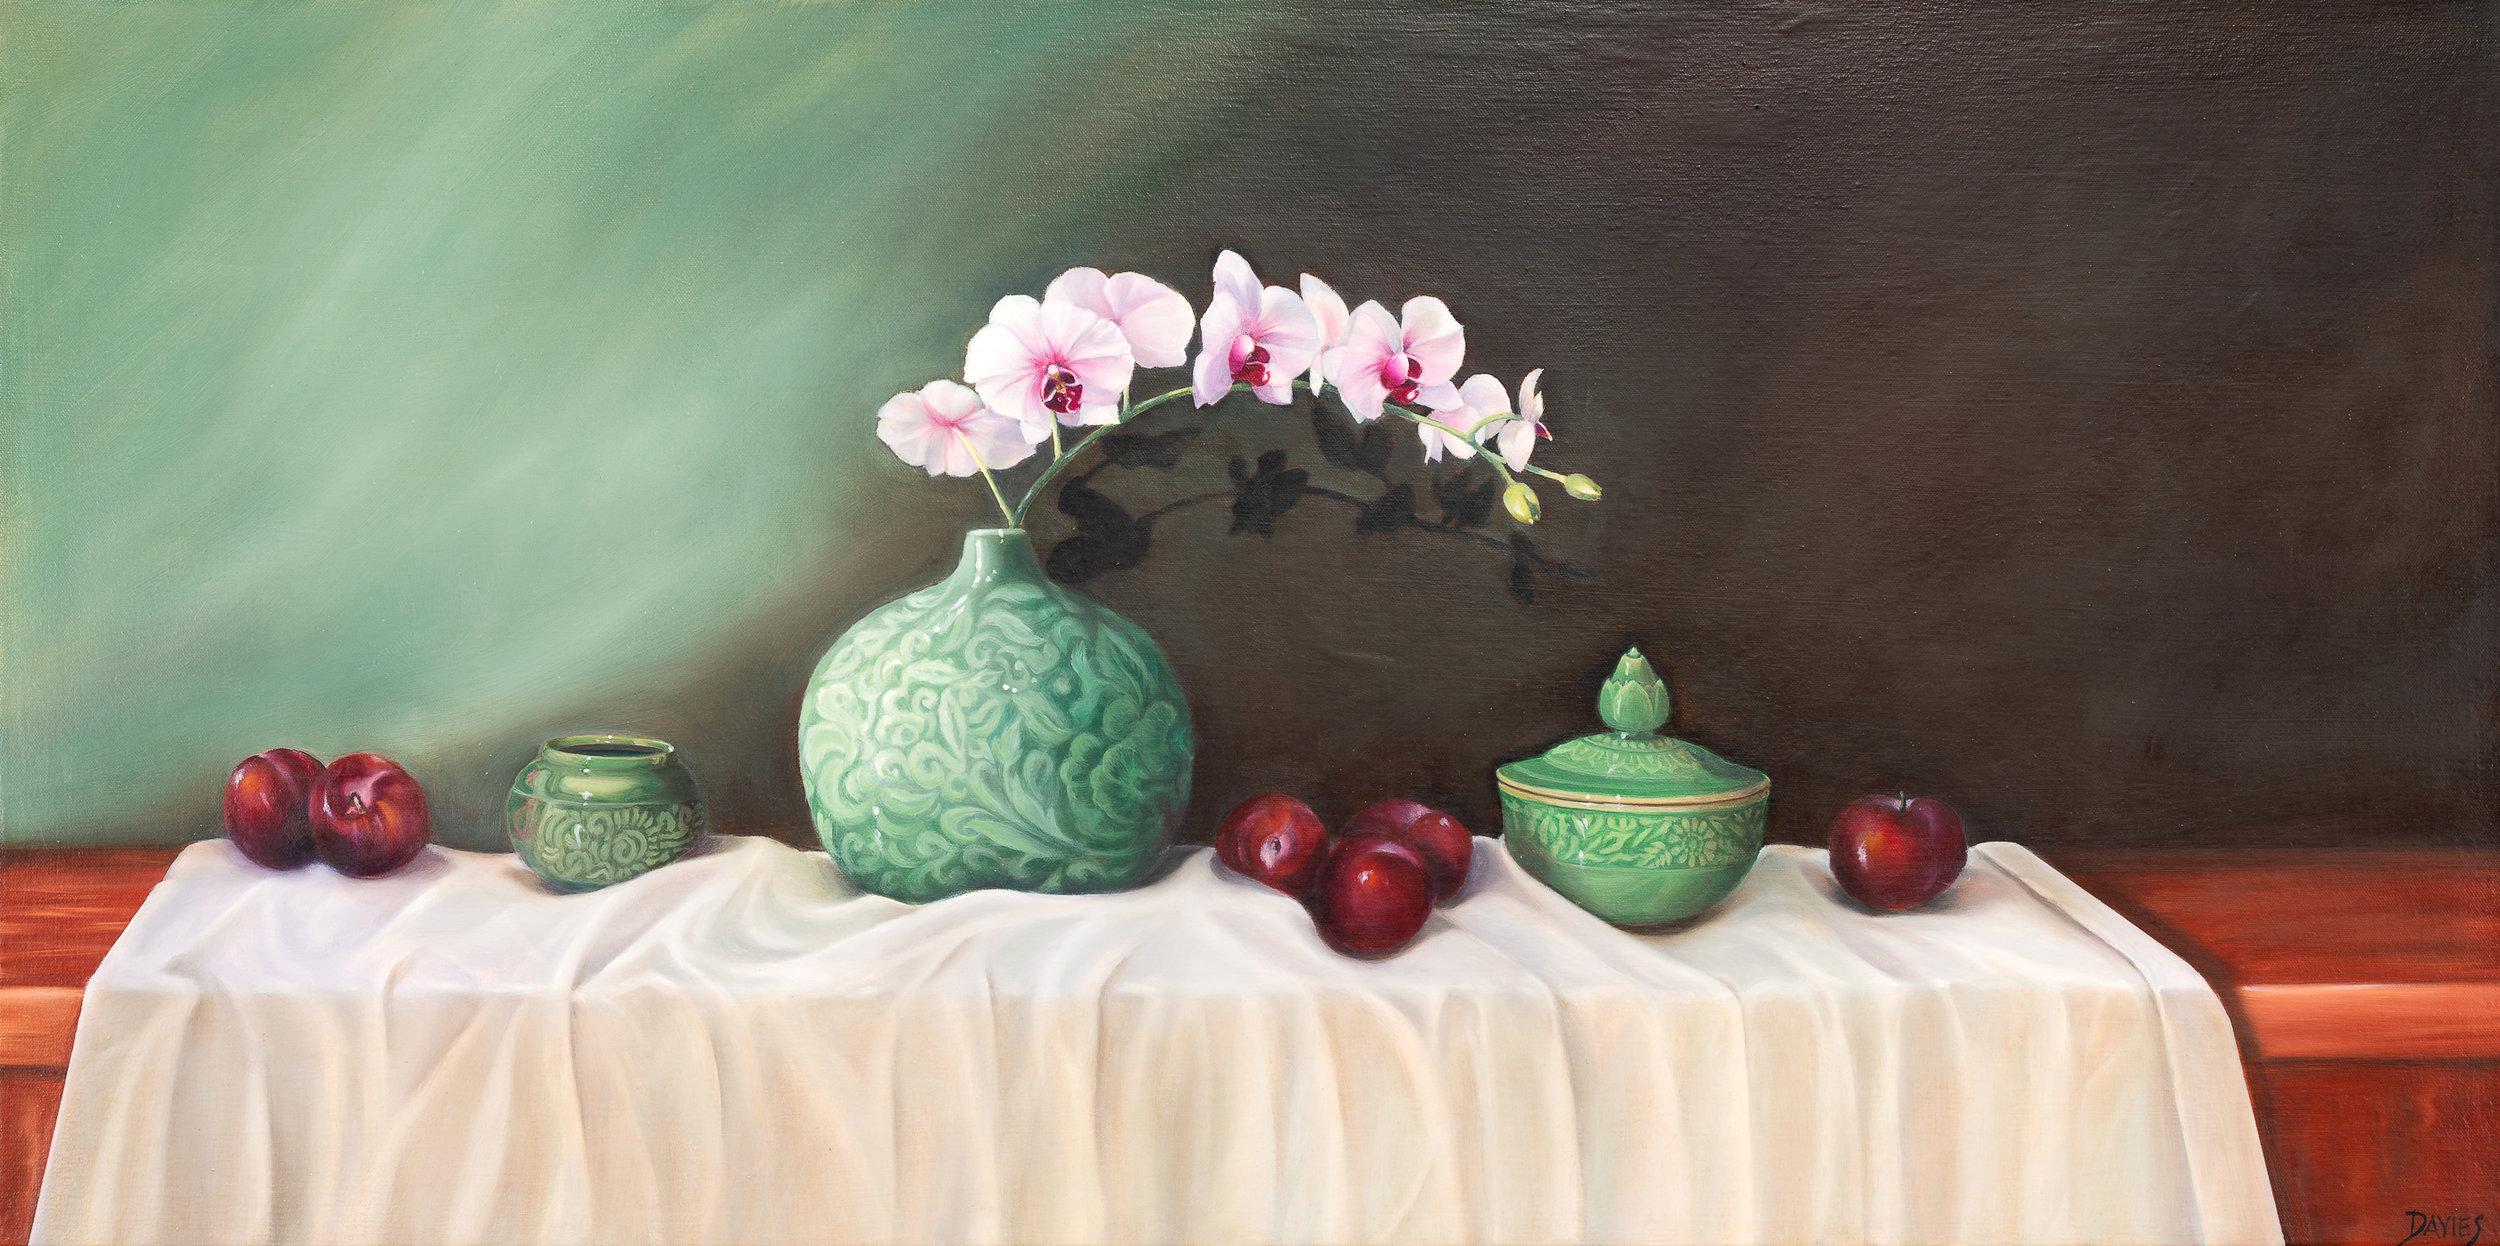 Dorothy Davies, Celadon Inflorescence,2018,Oil on canvas,600x1200.jpg